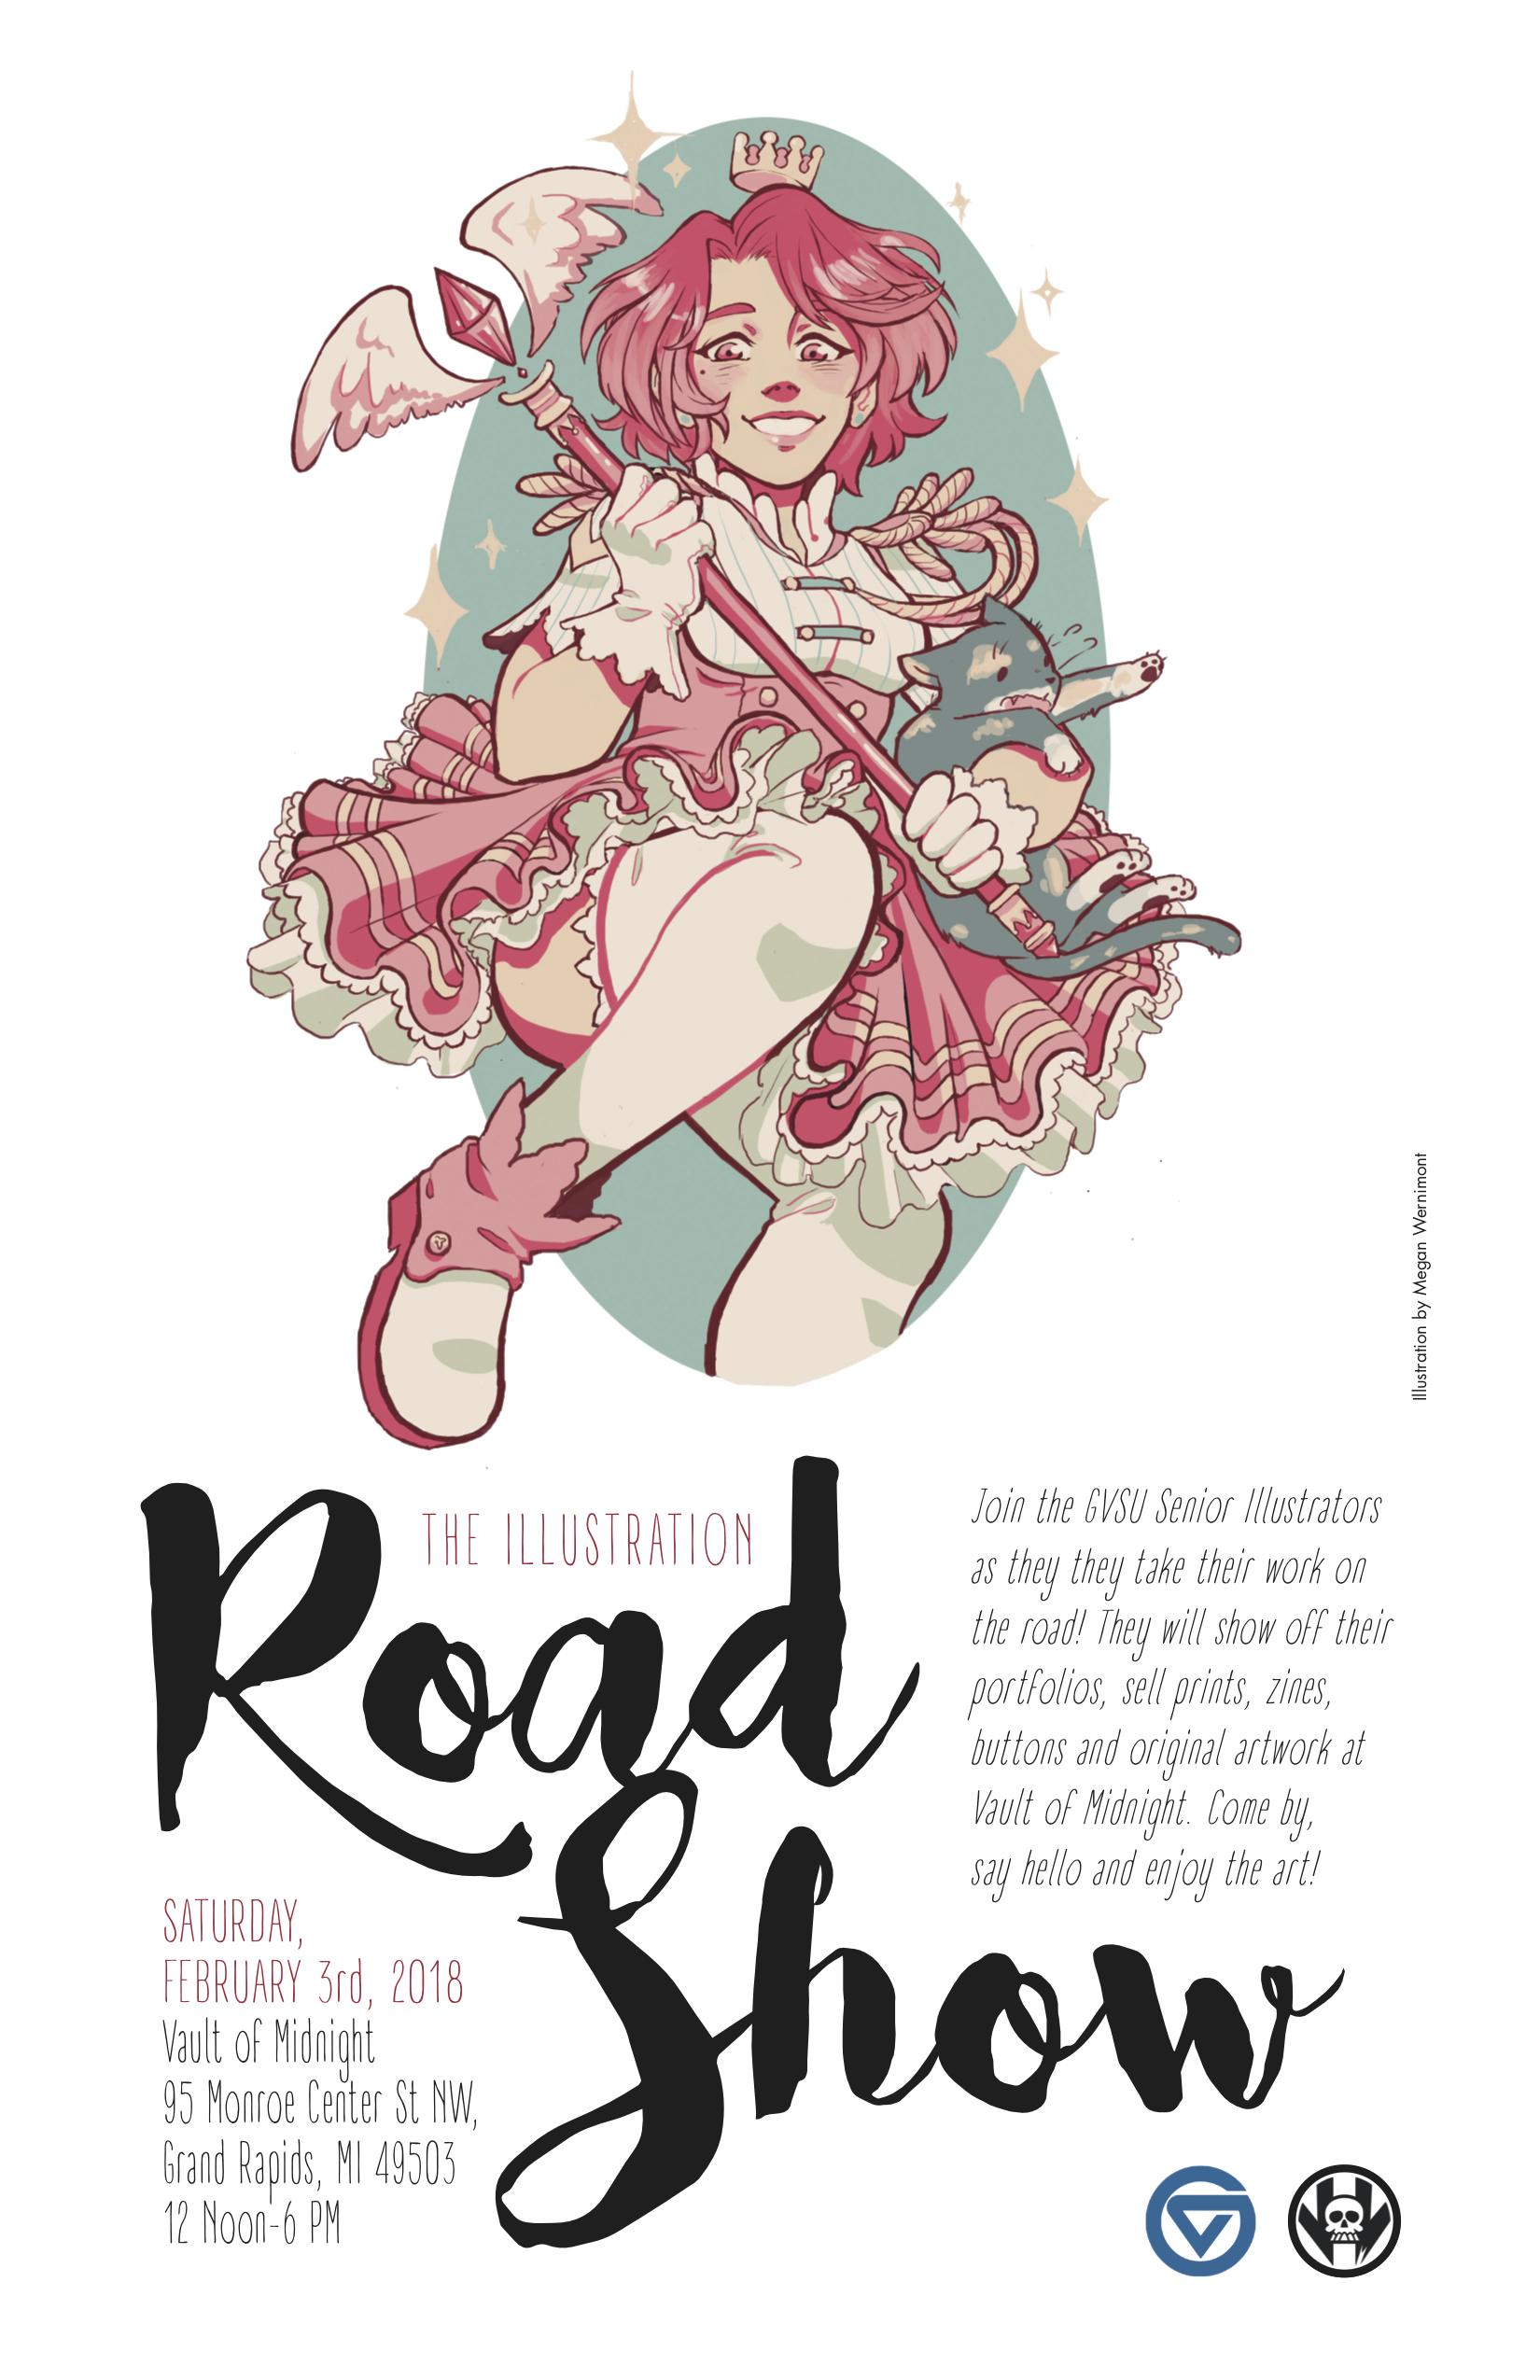 2018 Illustration Road Show.jpg